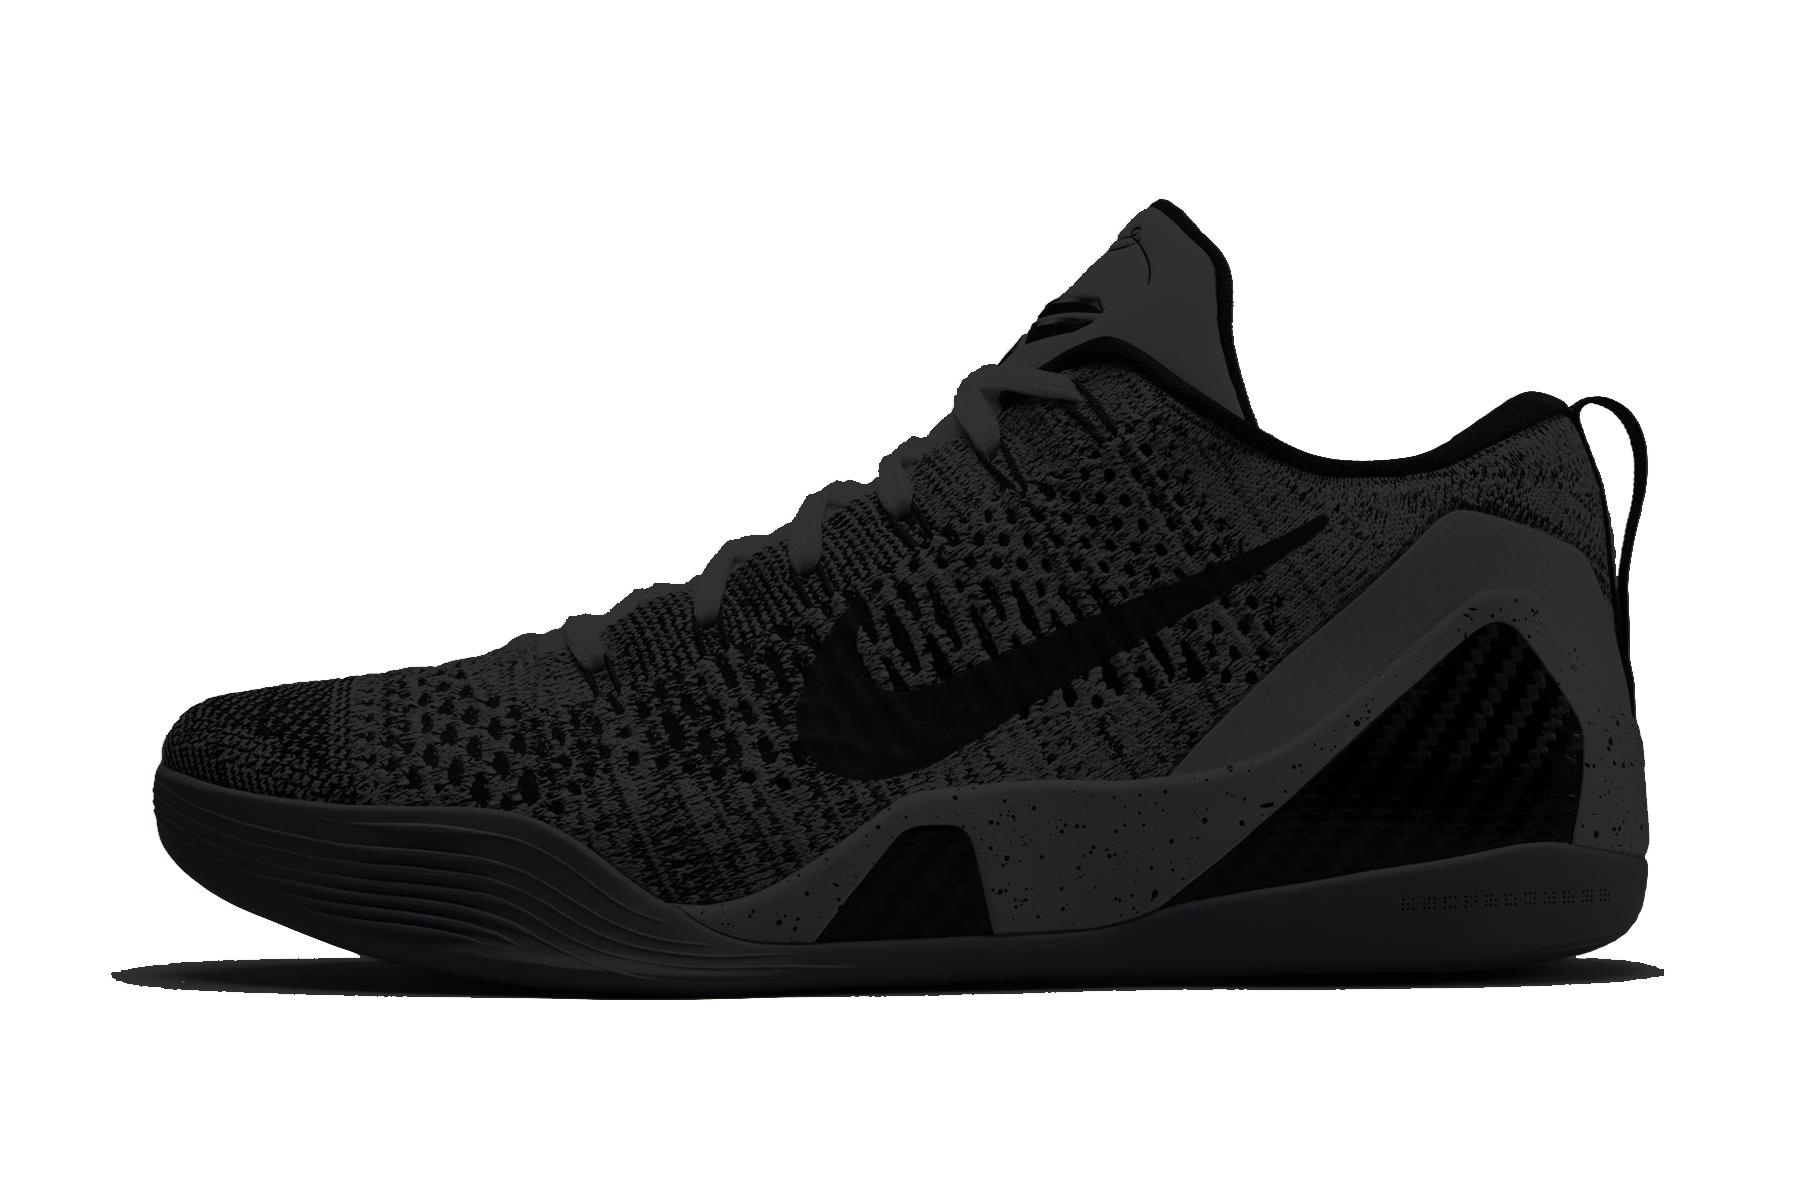 Nike Kobe X Potential Tech Specs Main